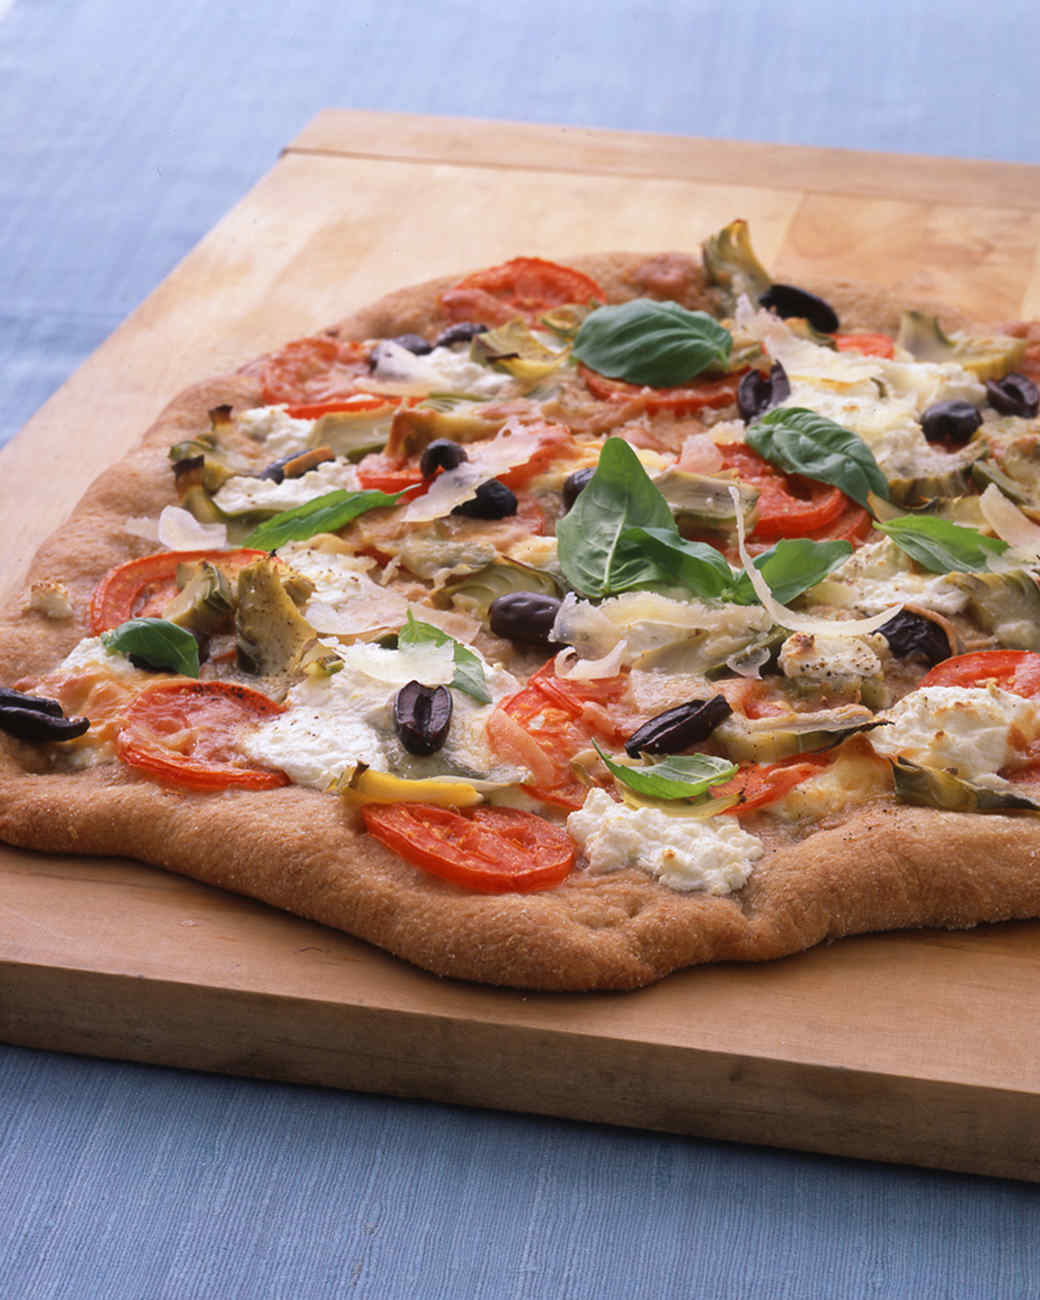 ba10286301_0507_pizza.jpg